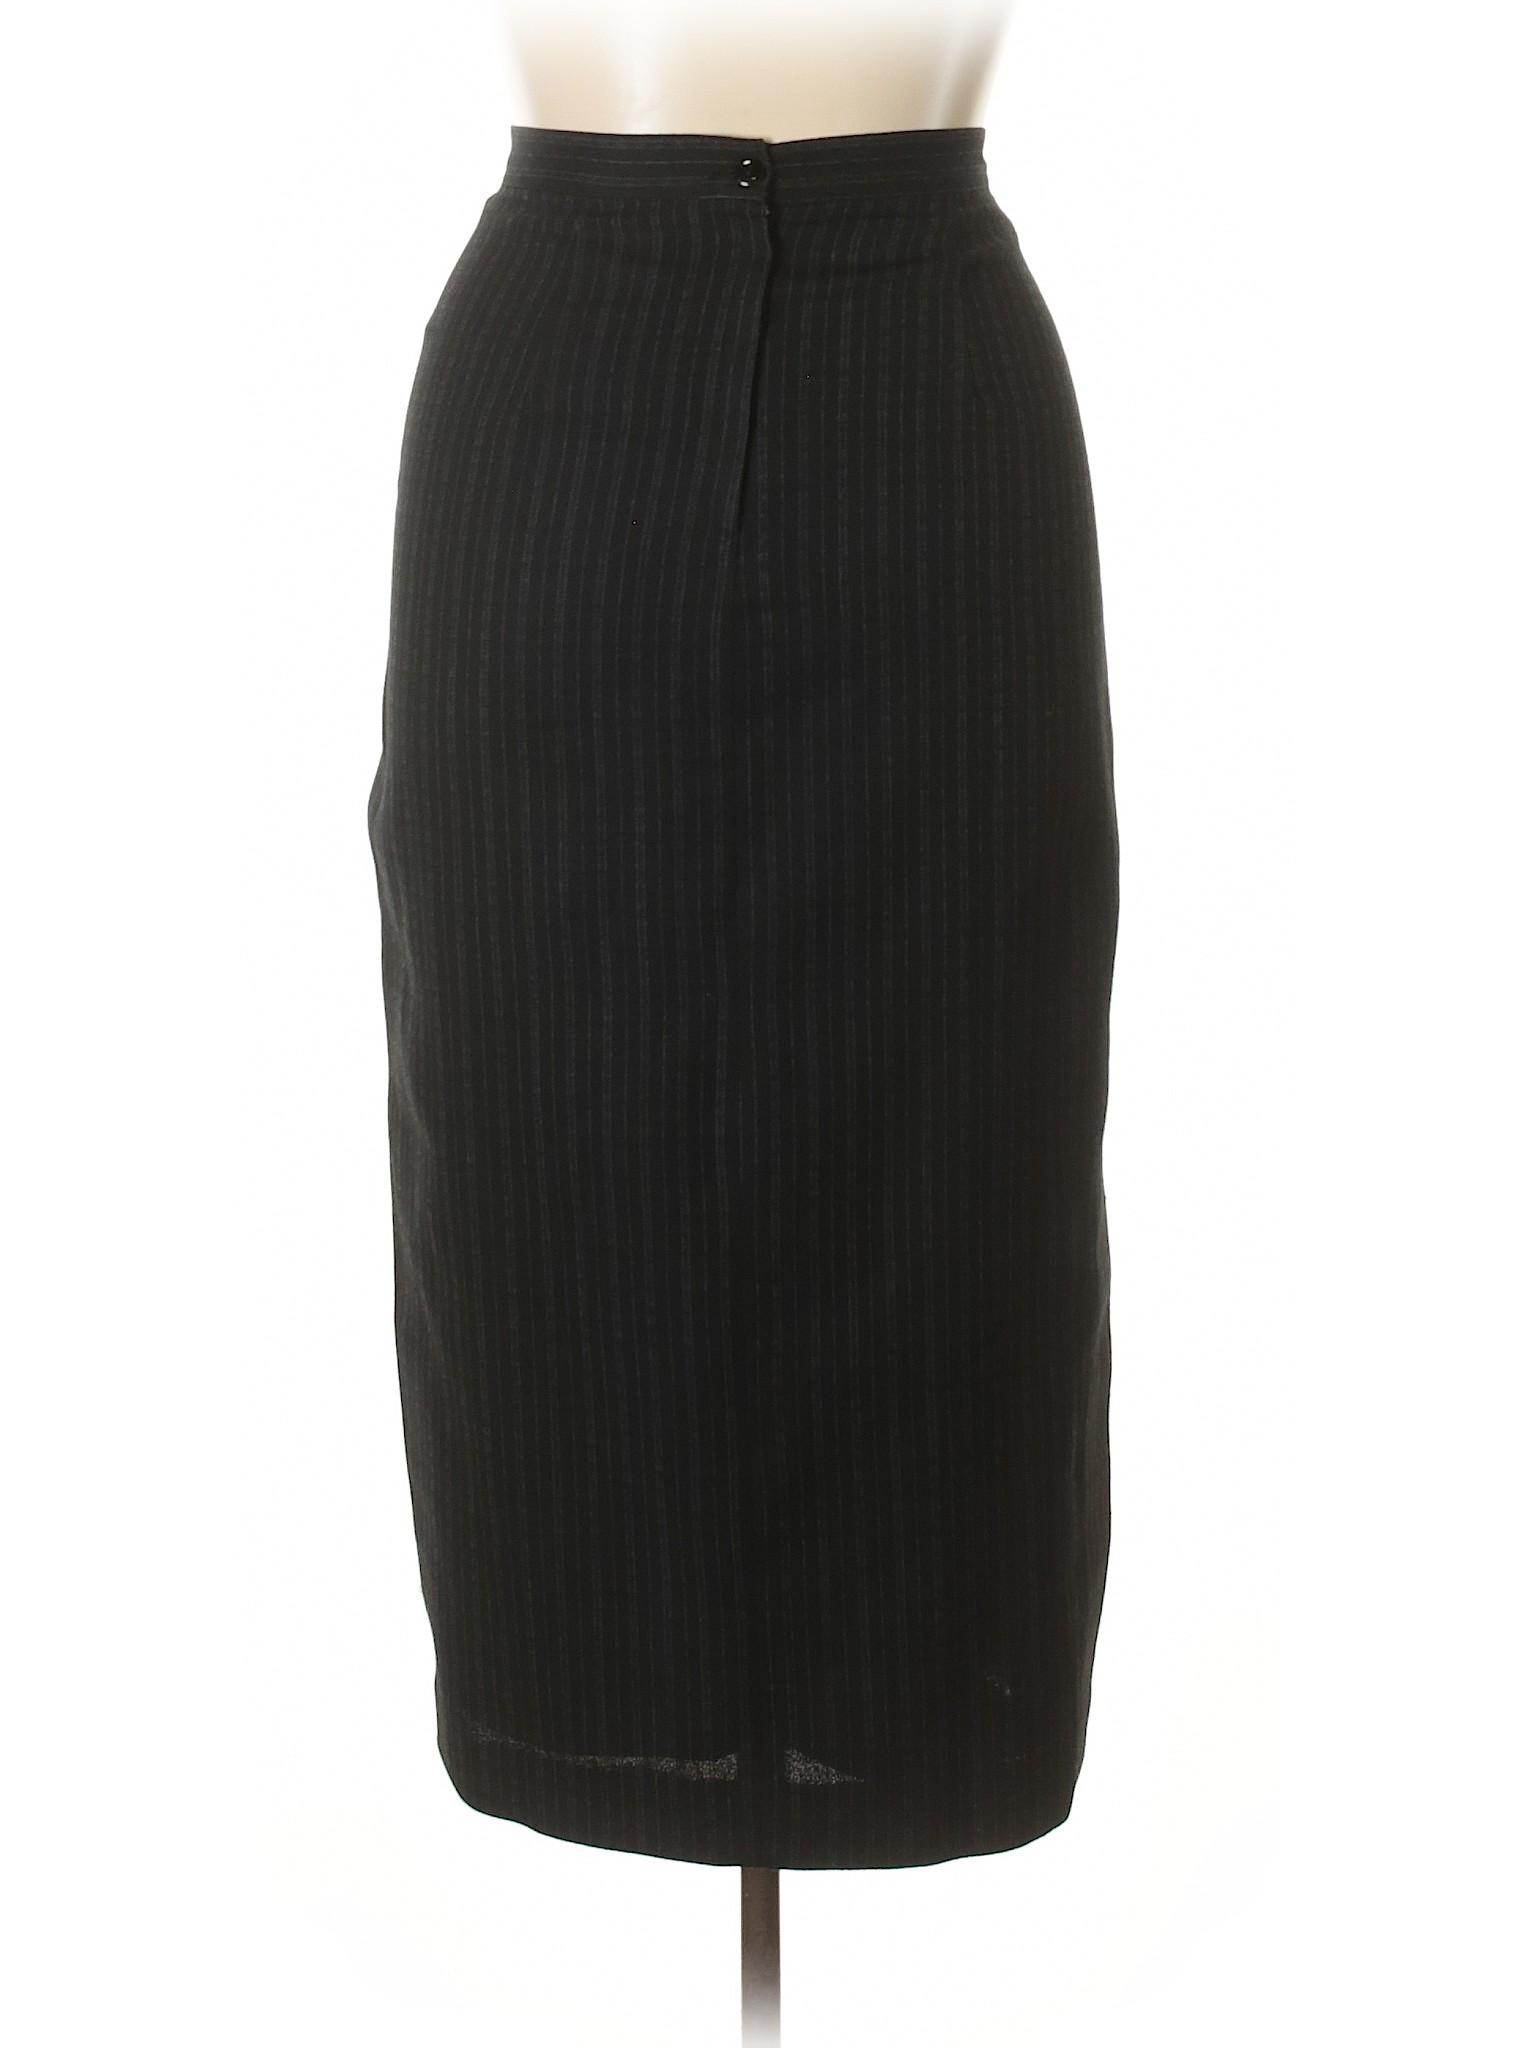 Casual Casual Boutique Skirt Boutique Casual Boutique Skirt Casual Skirt Boutique wggXqIB